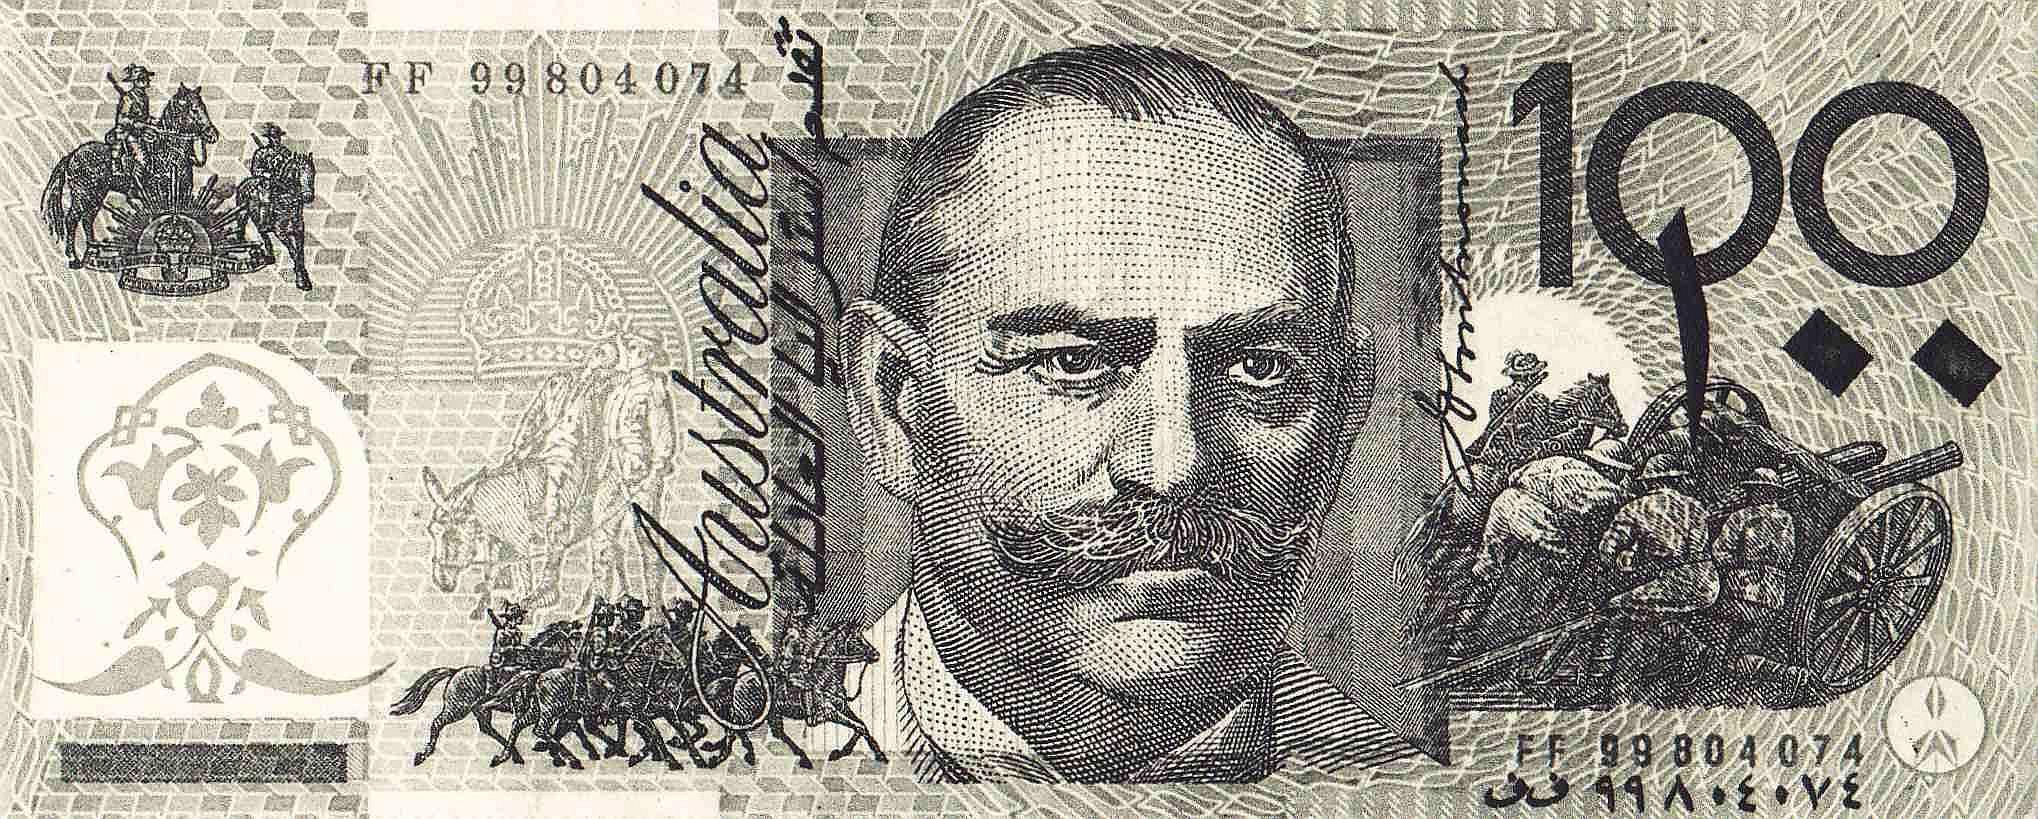 Deanna Hitti_Banknote_The Green Line.jpg